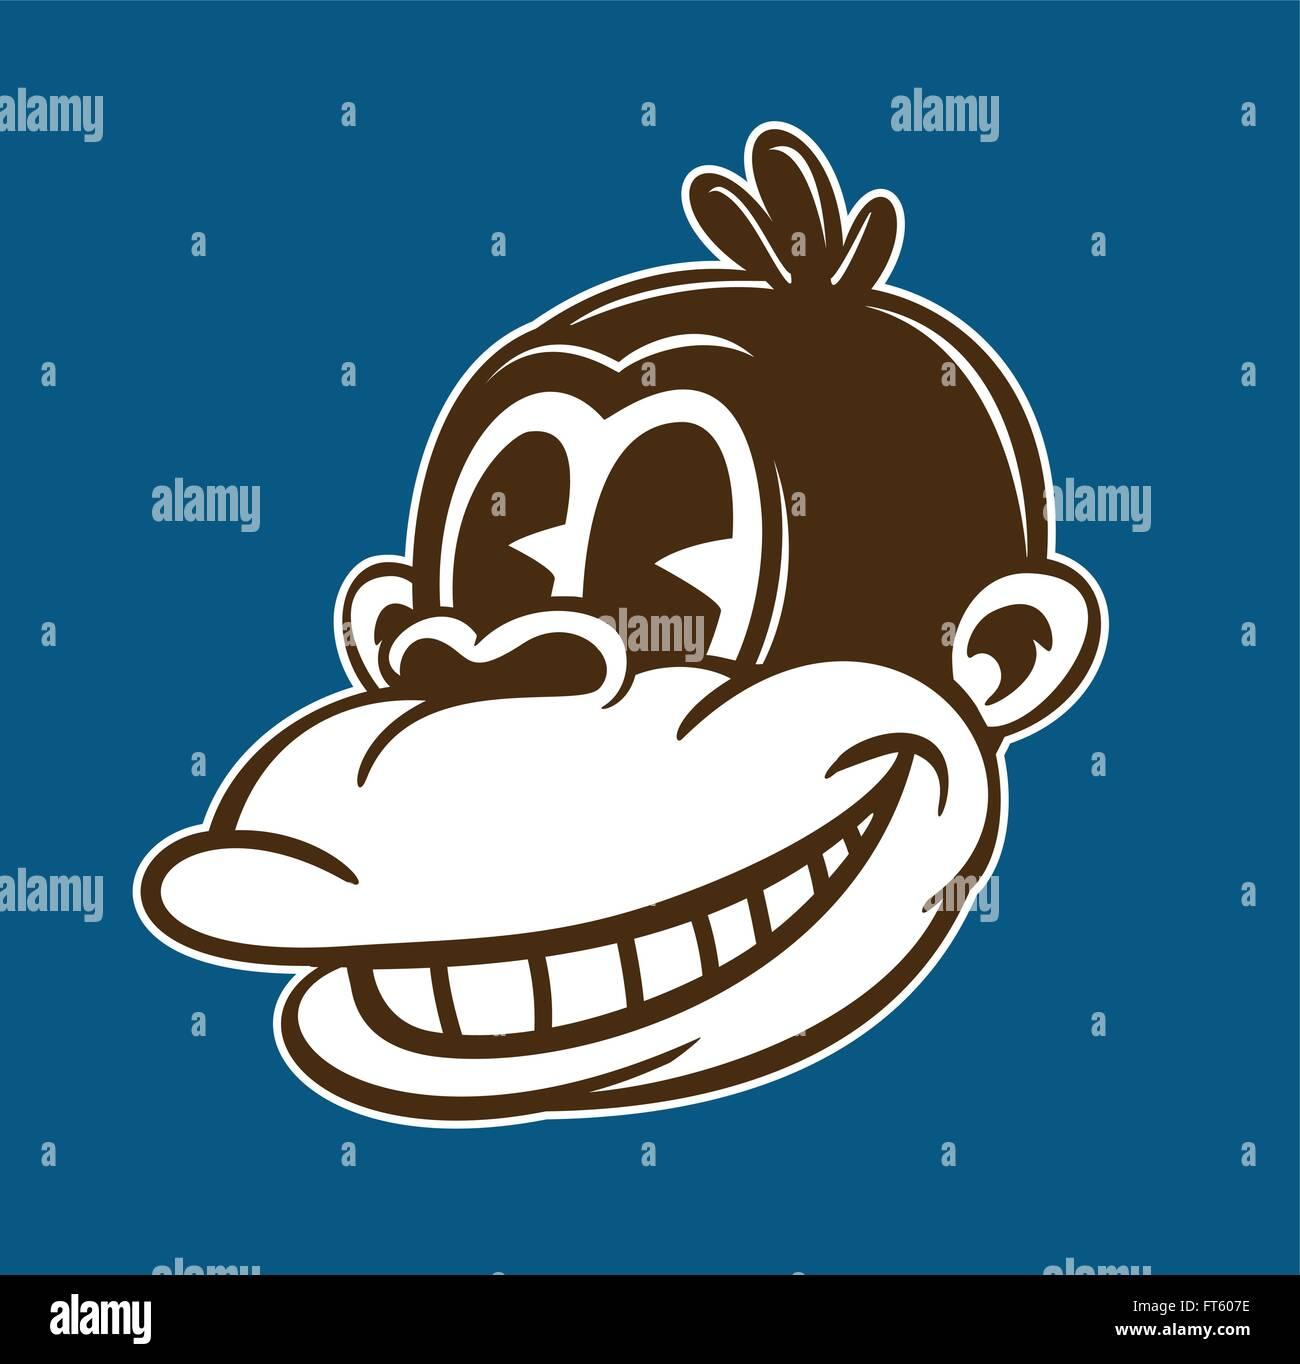 Vintage Toons: Retro-Affe Comicfigur, Ape Smiley, klassischen Stil-Vektor-Illustration Stockbild